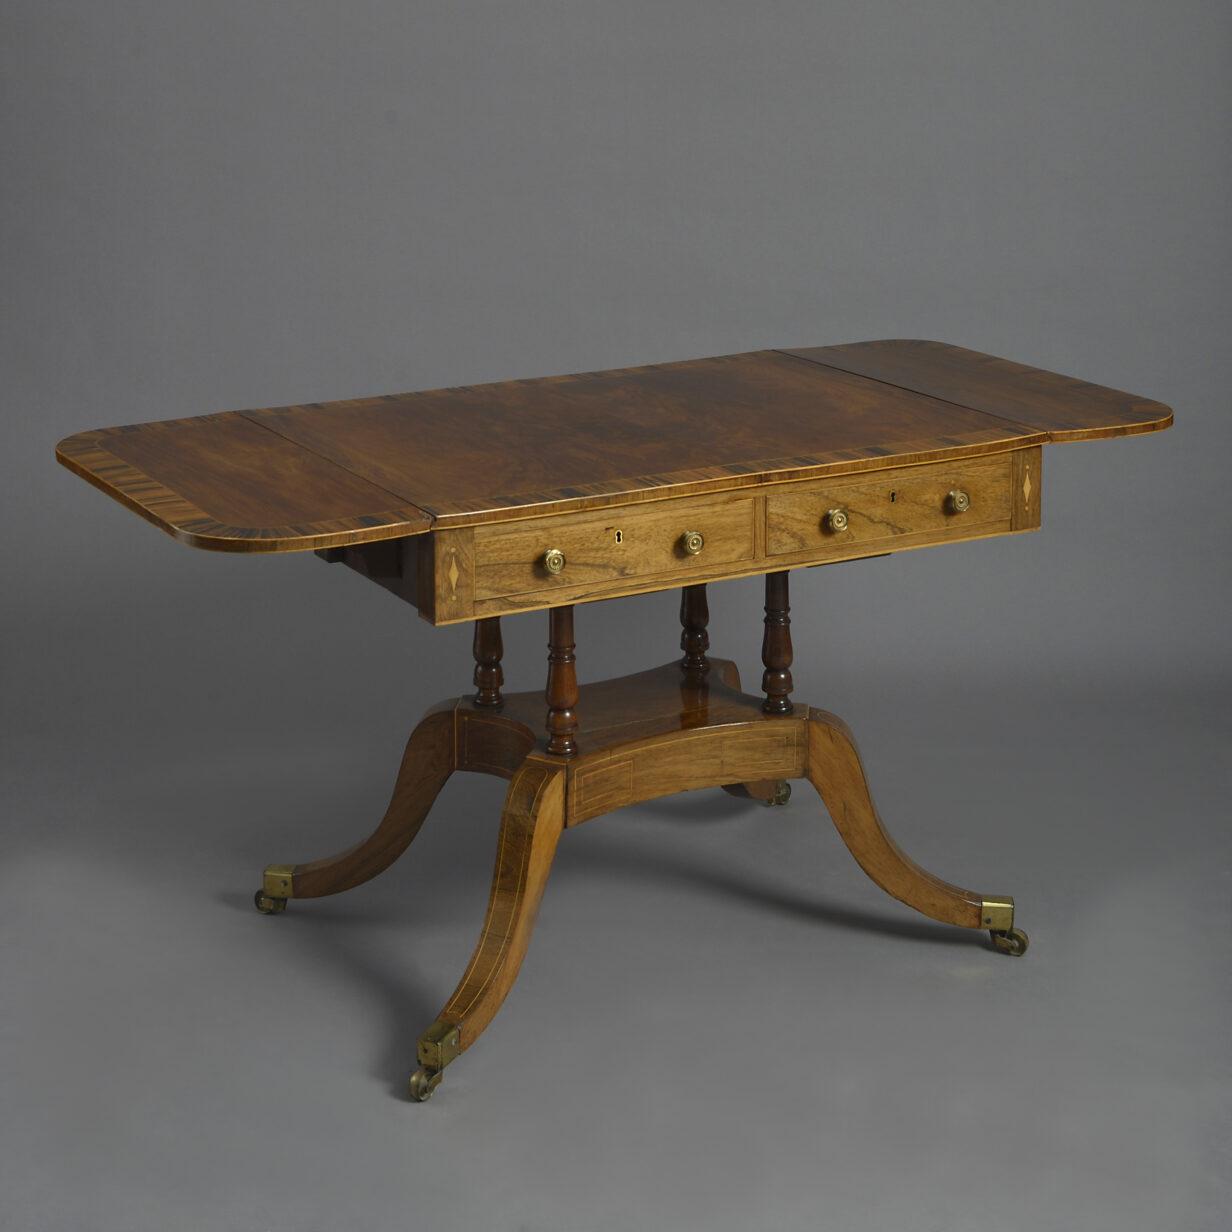 Regeny Rosewood and Calamander Sofa Table